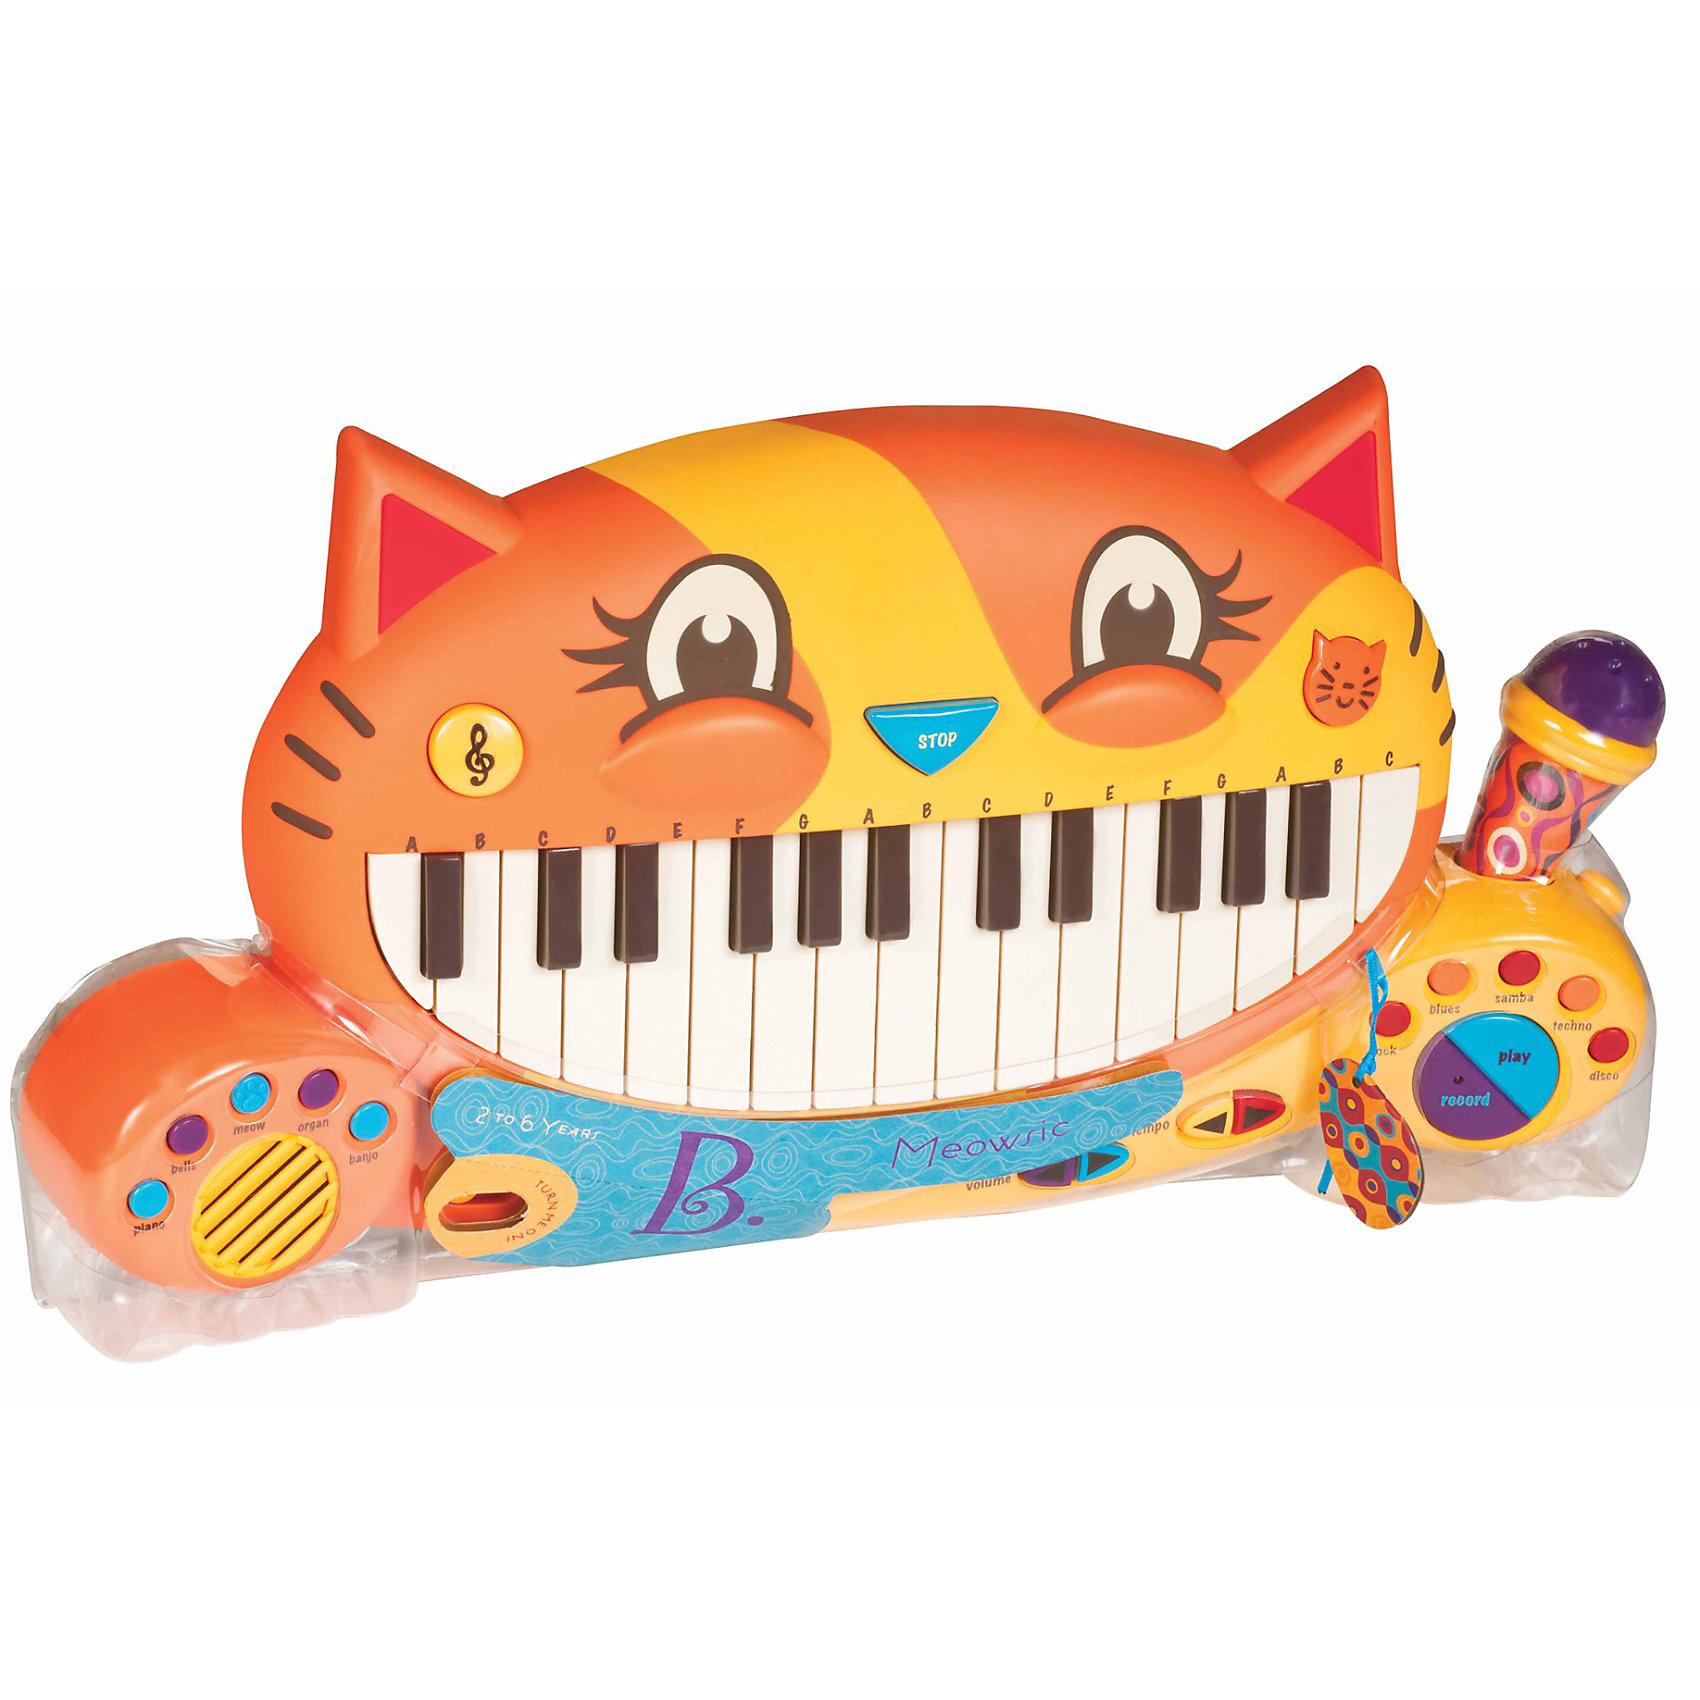 - Мини-пианино, B DOT банкетку для пианино в новокузнецке